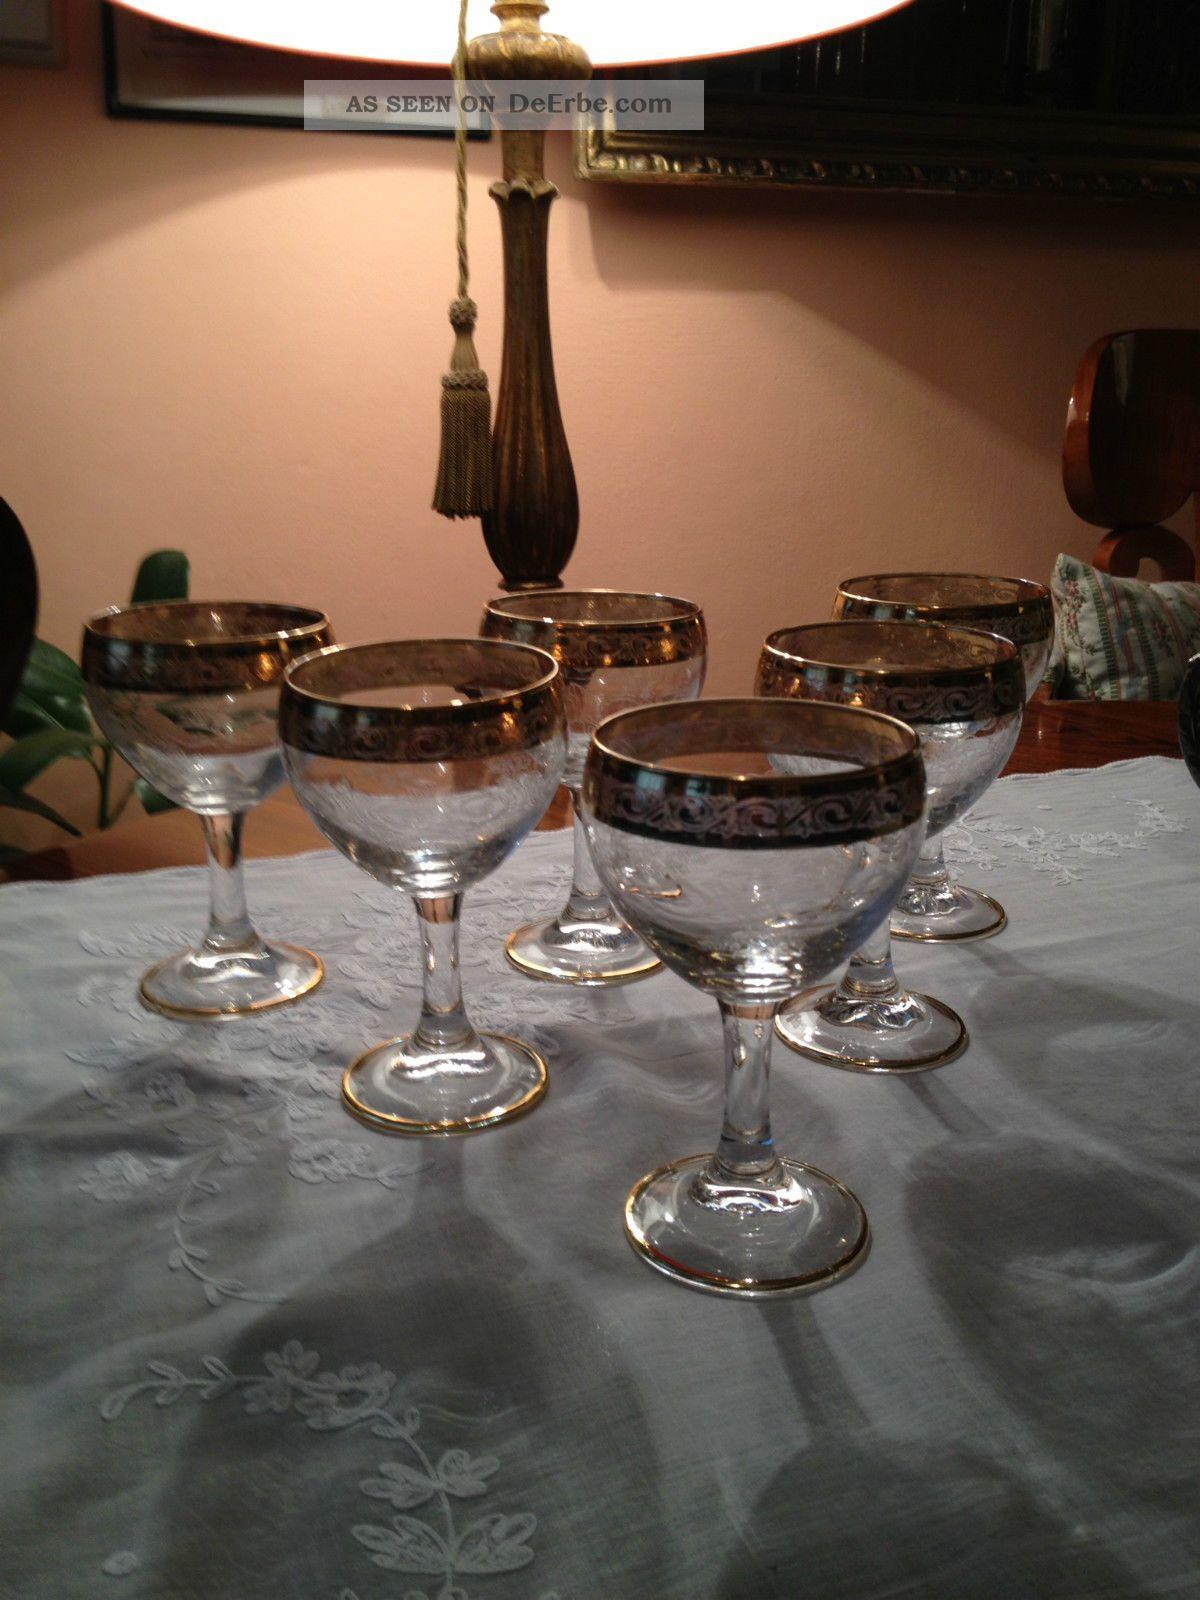 6 murano medici portwein gl ser dessertwein glas echt gold rand 1960. Black Bedroom Furniture Sets. Home Design Ideas